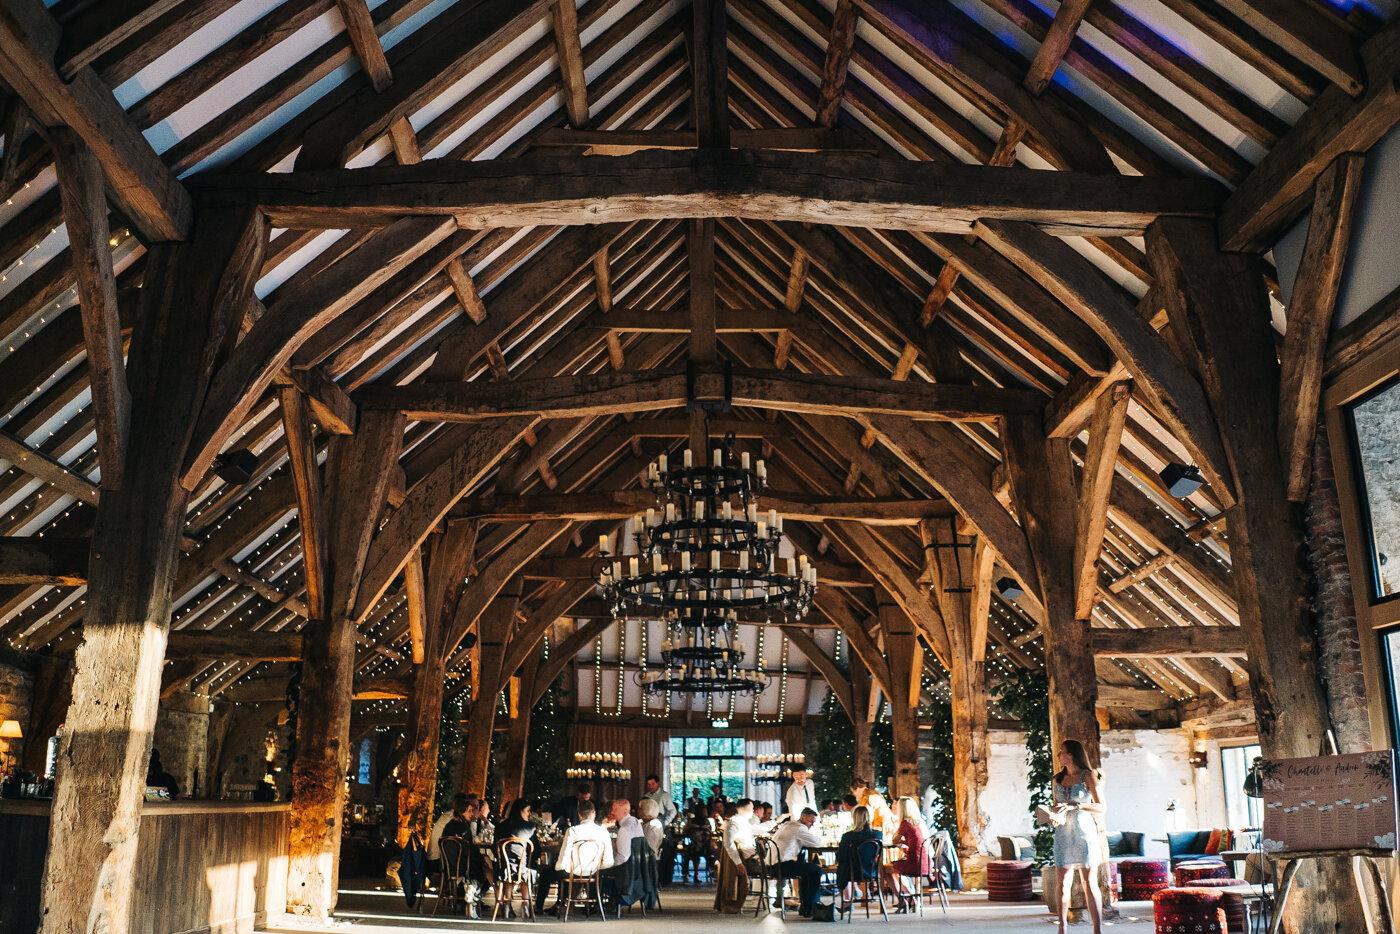 tithe-barn-bolton-abbey-north-yorkshire-cripps-wedding-photographer-creative-0052.jpg